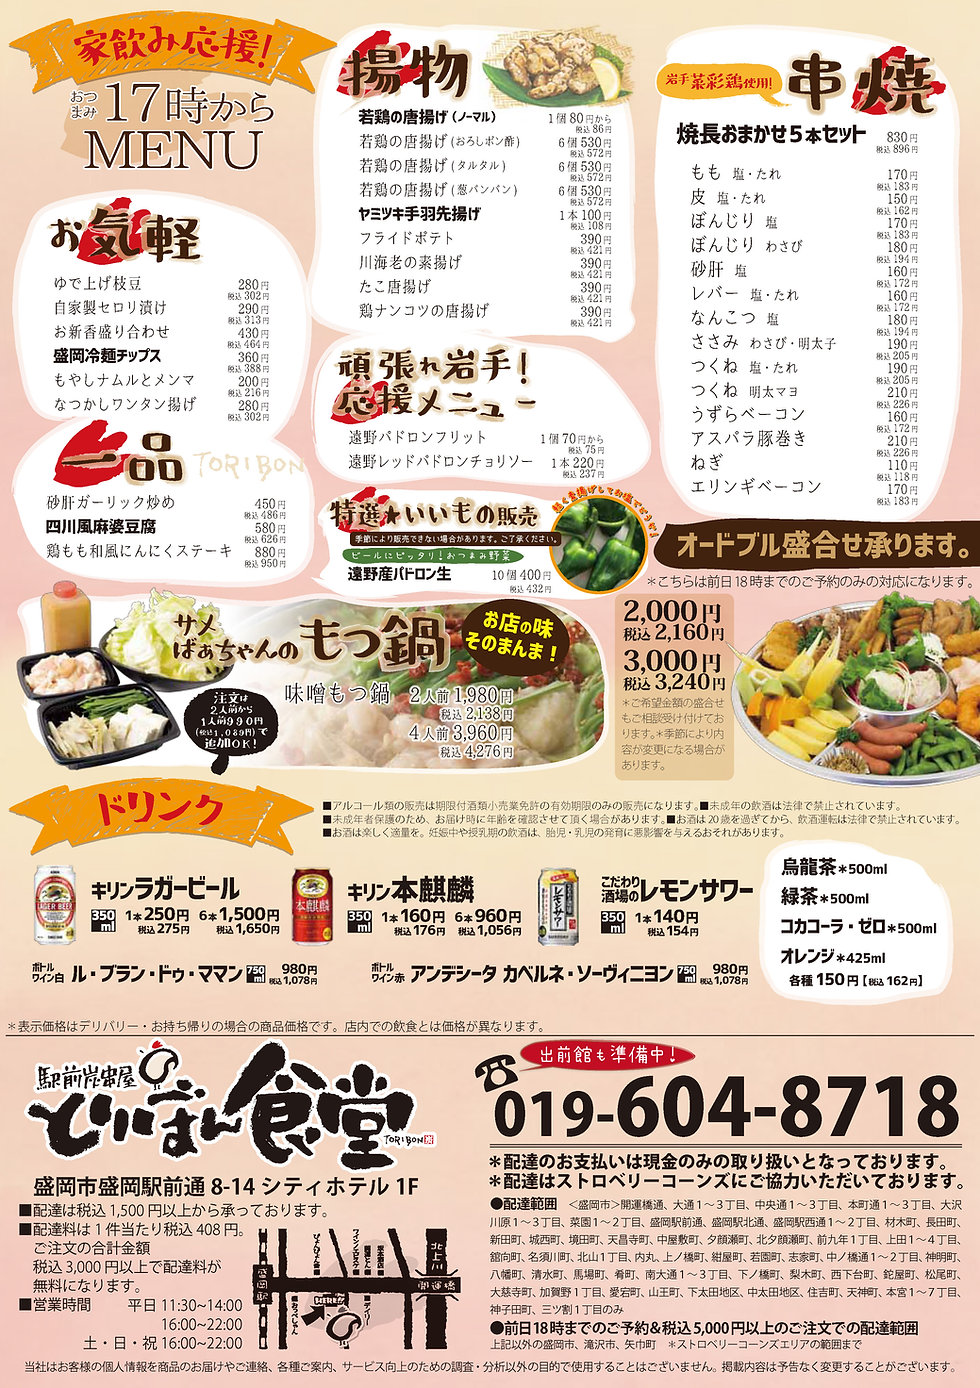 menu_Toribon Shokudo b.jpg